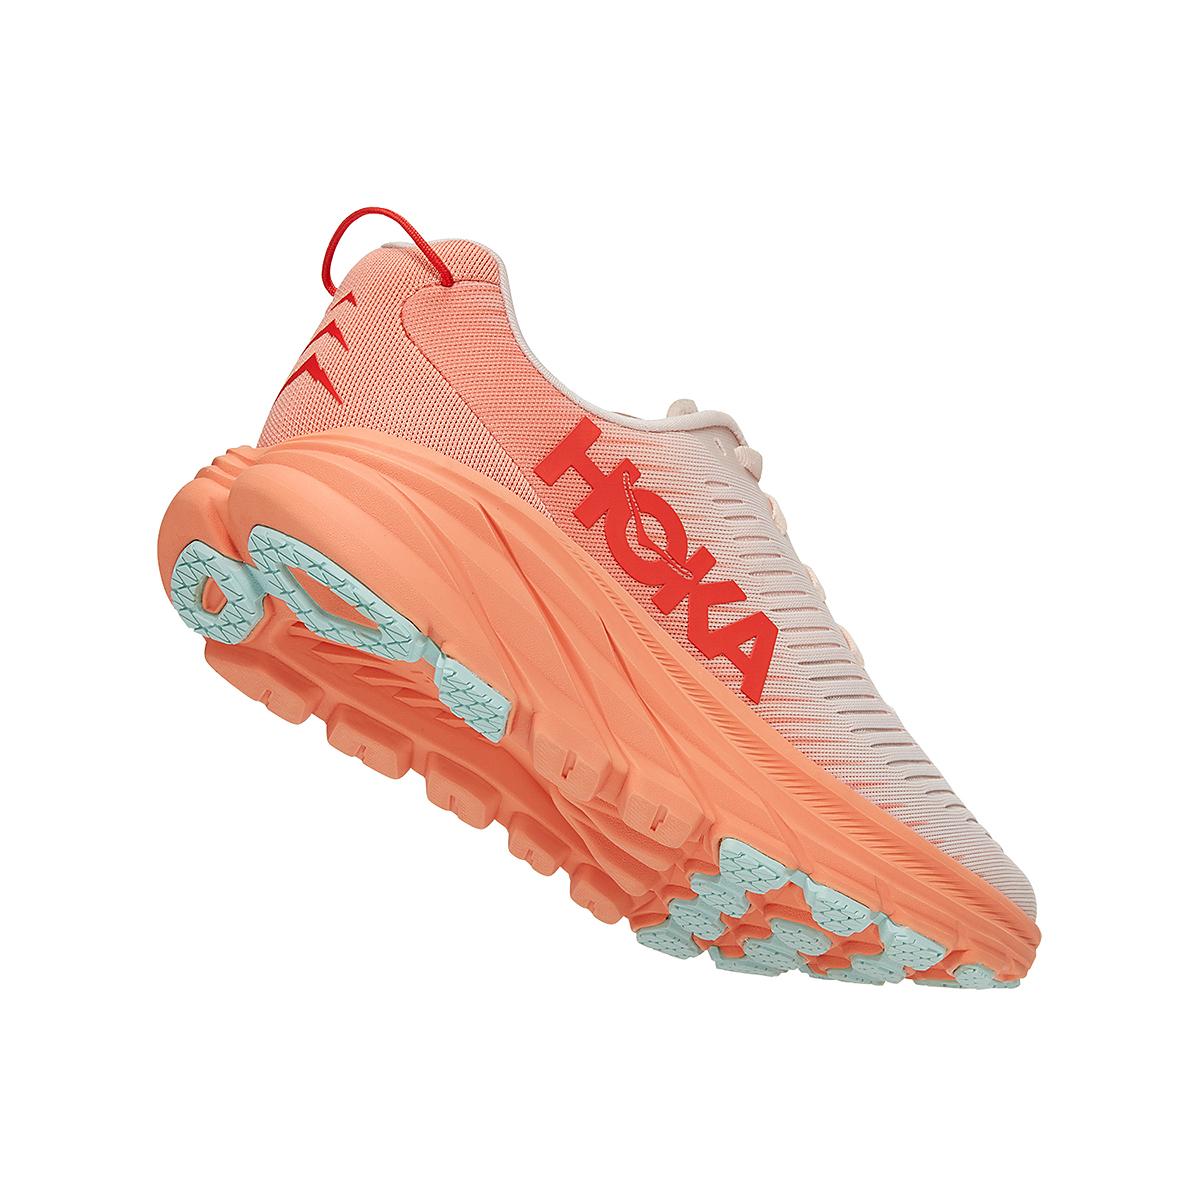 Women's Hoka One One Rincon 3 Running Shoe - Color: Silver Peony/Cantaloupe - Size: 5 - Width: Regular, Silver Peony/Cantaloupe, large, image 3